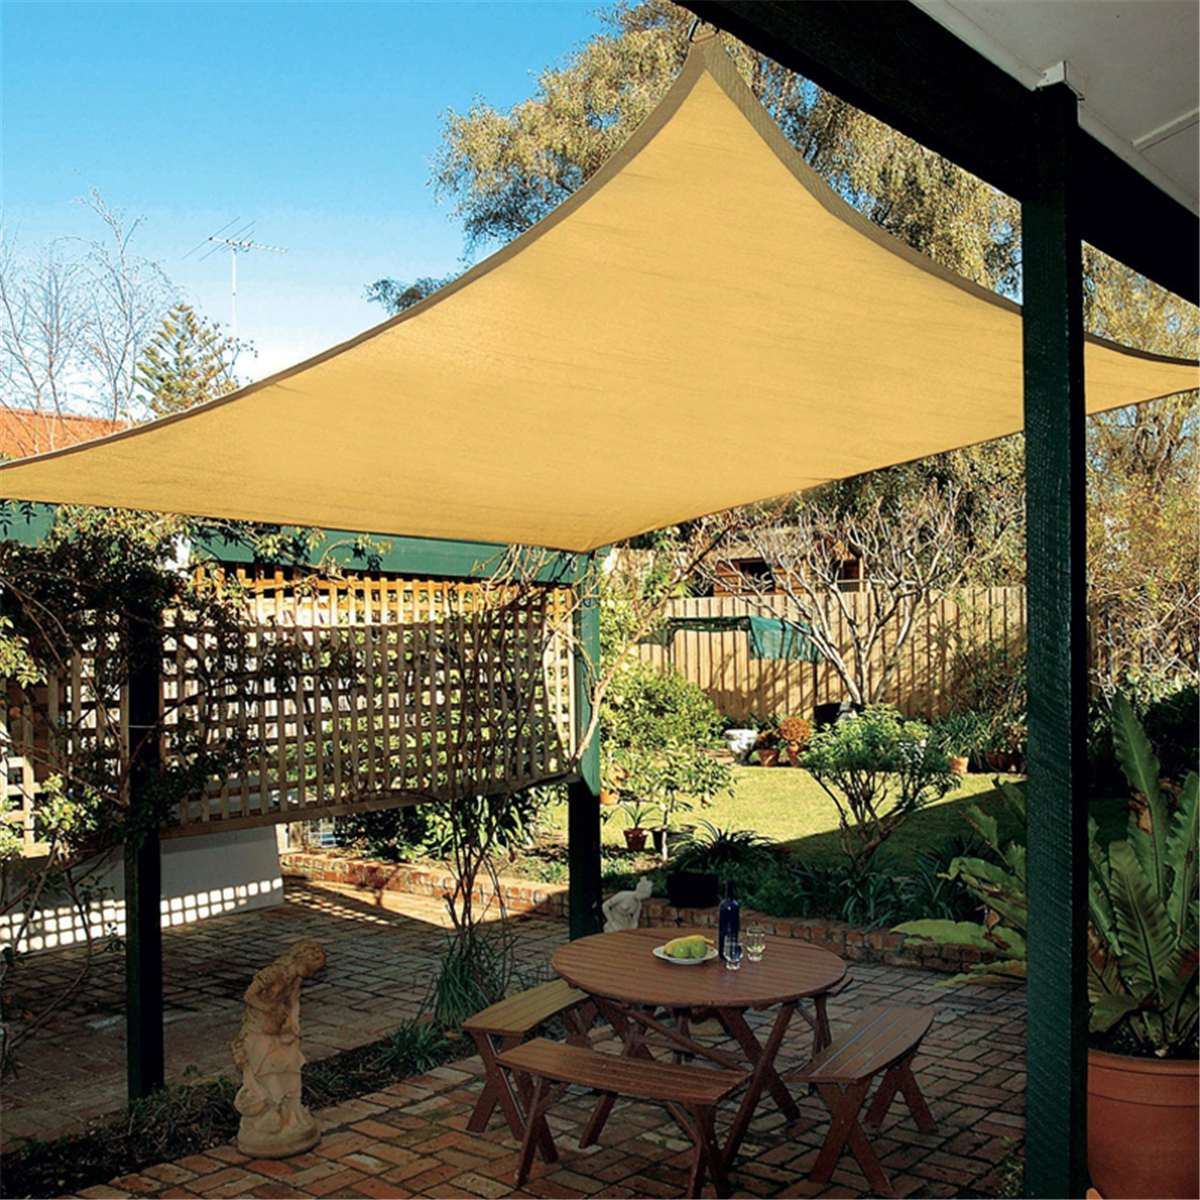 Hot sale 2.5x2.5M Rectangle Top Sun Shade Sail Shelter ...